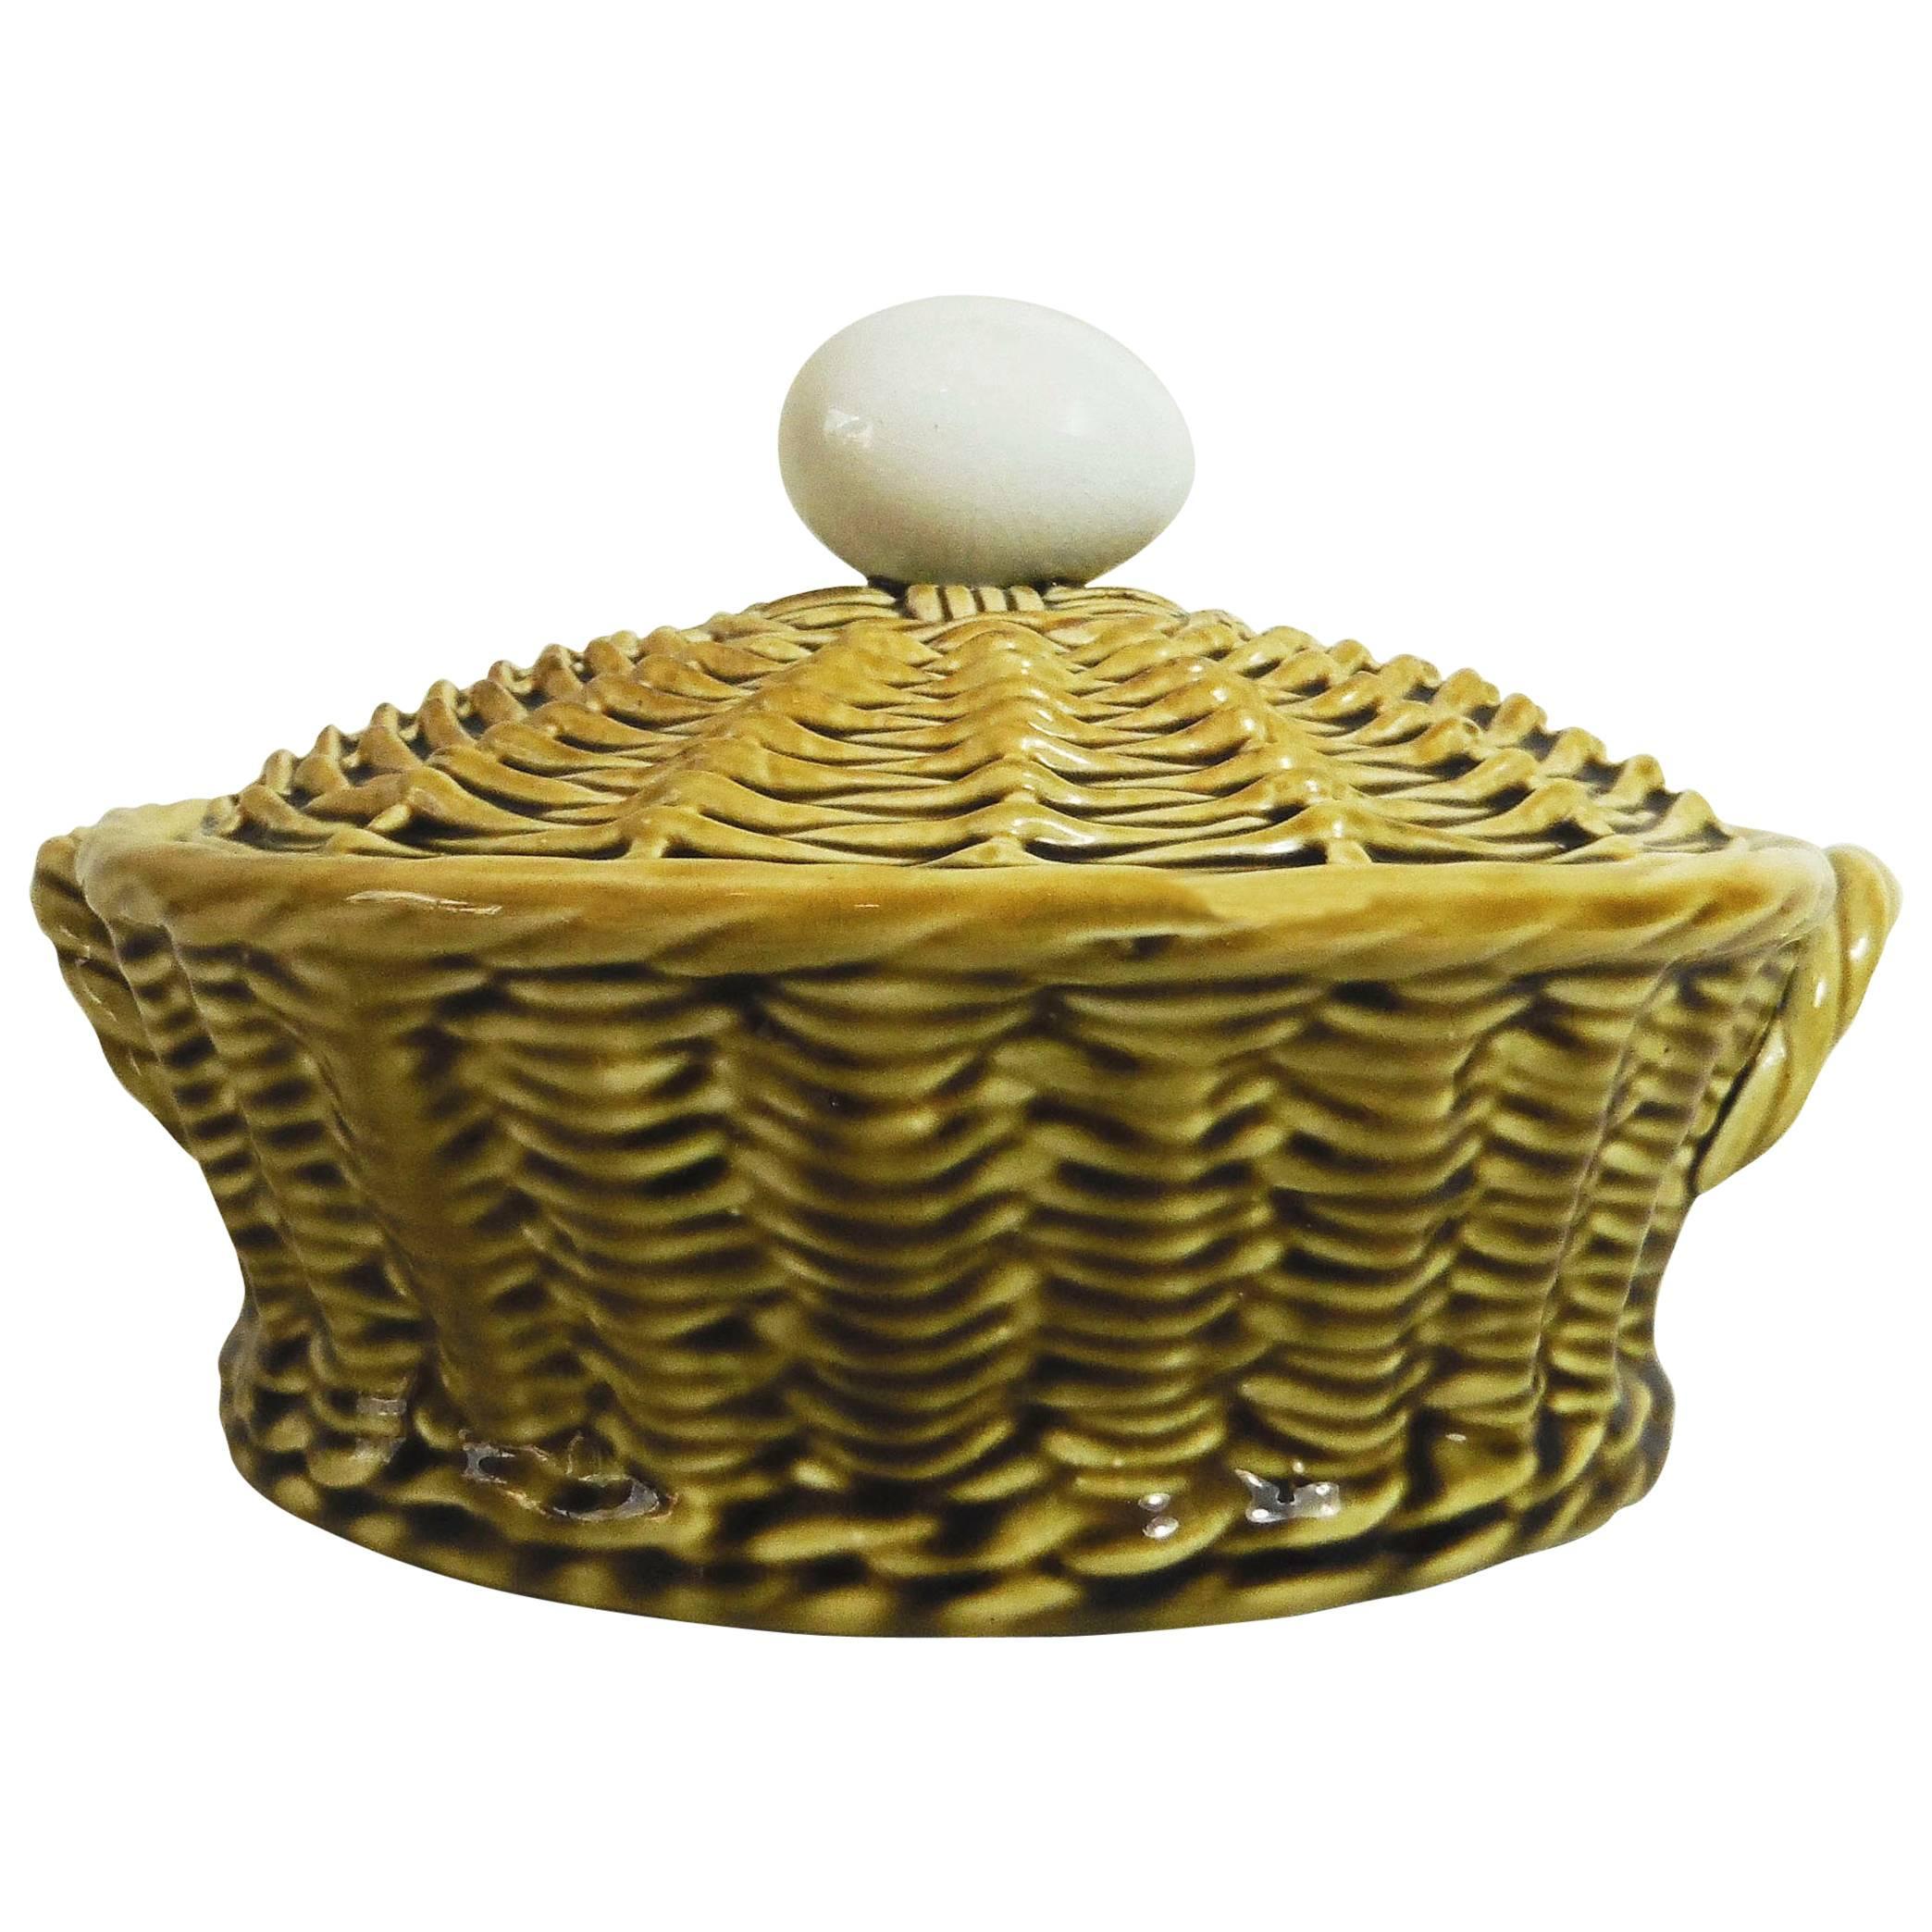 Majolica Egg Basket Sarreguemines, circa 1920 at 1stdibs